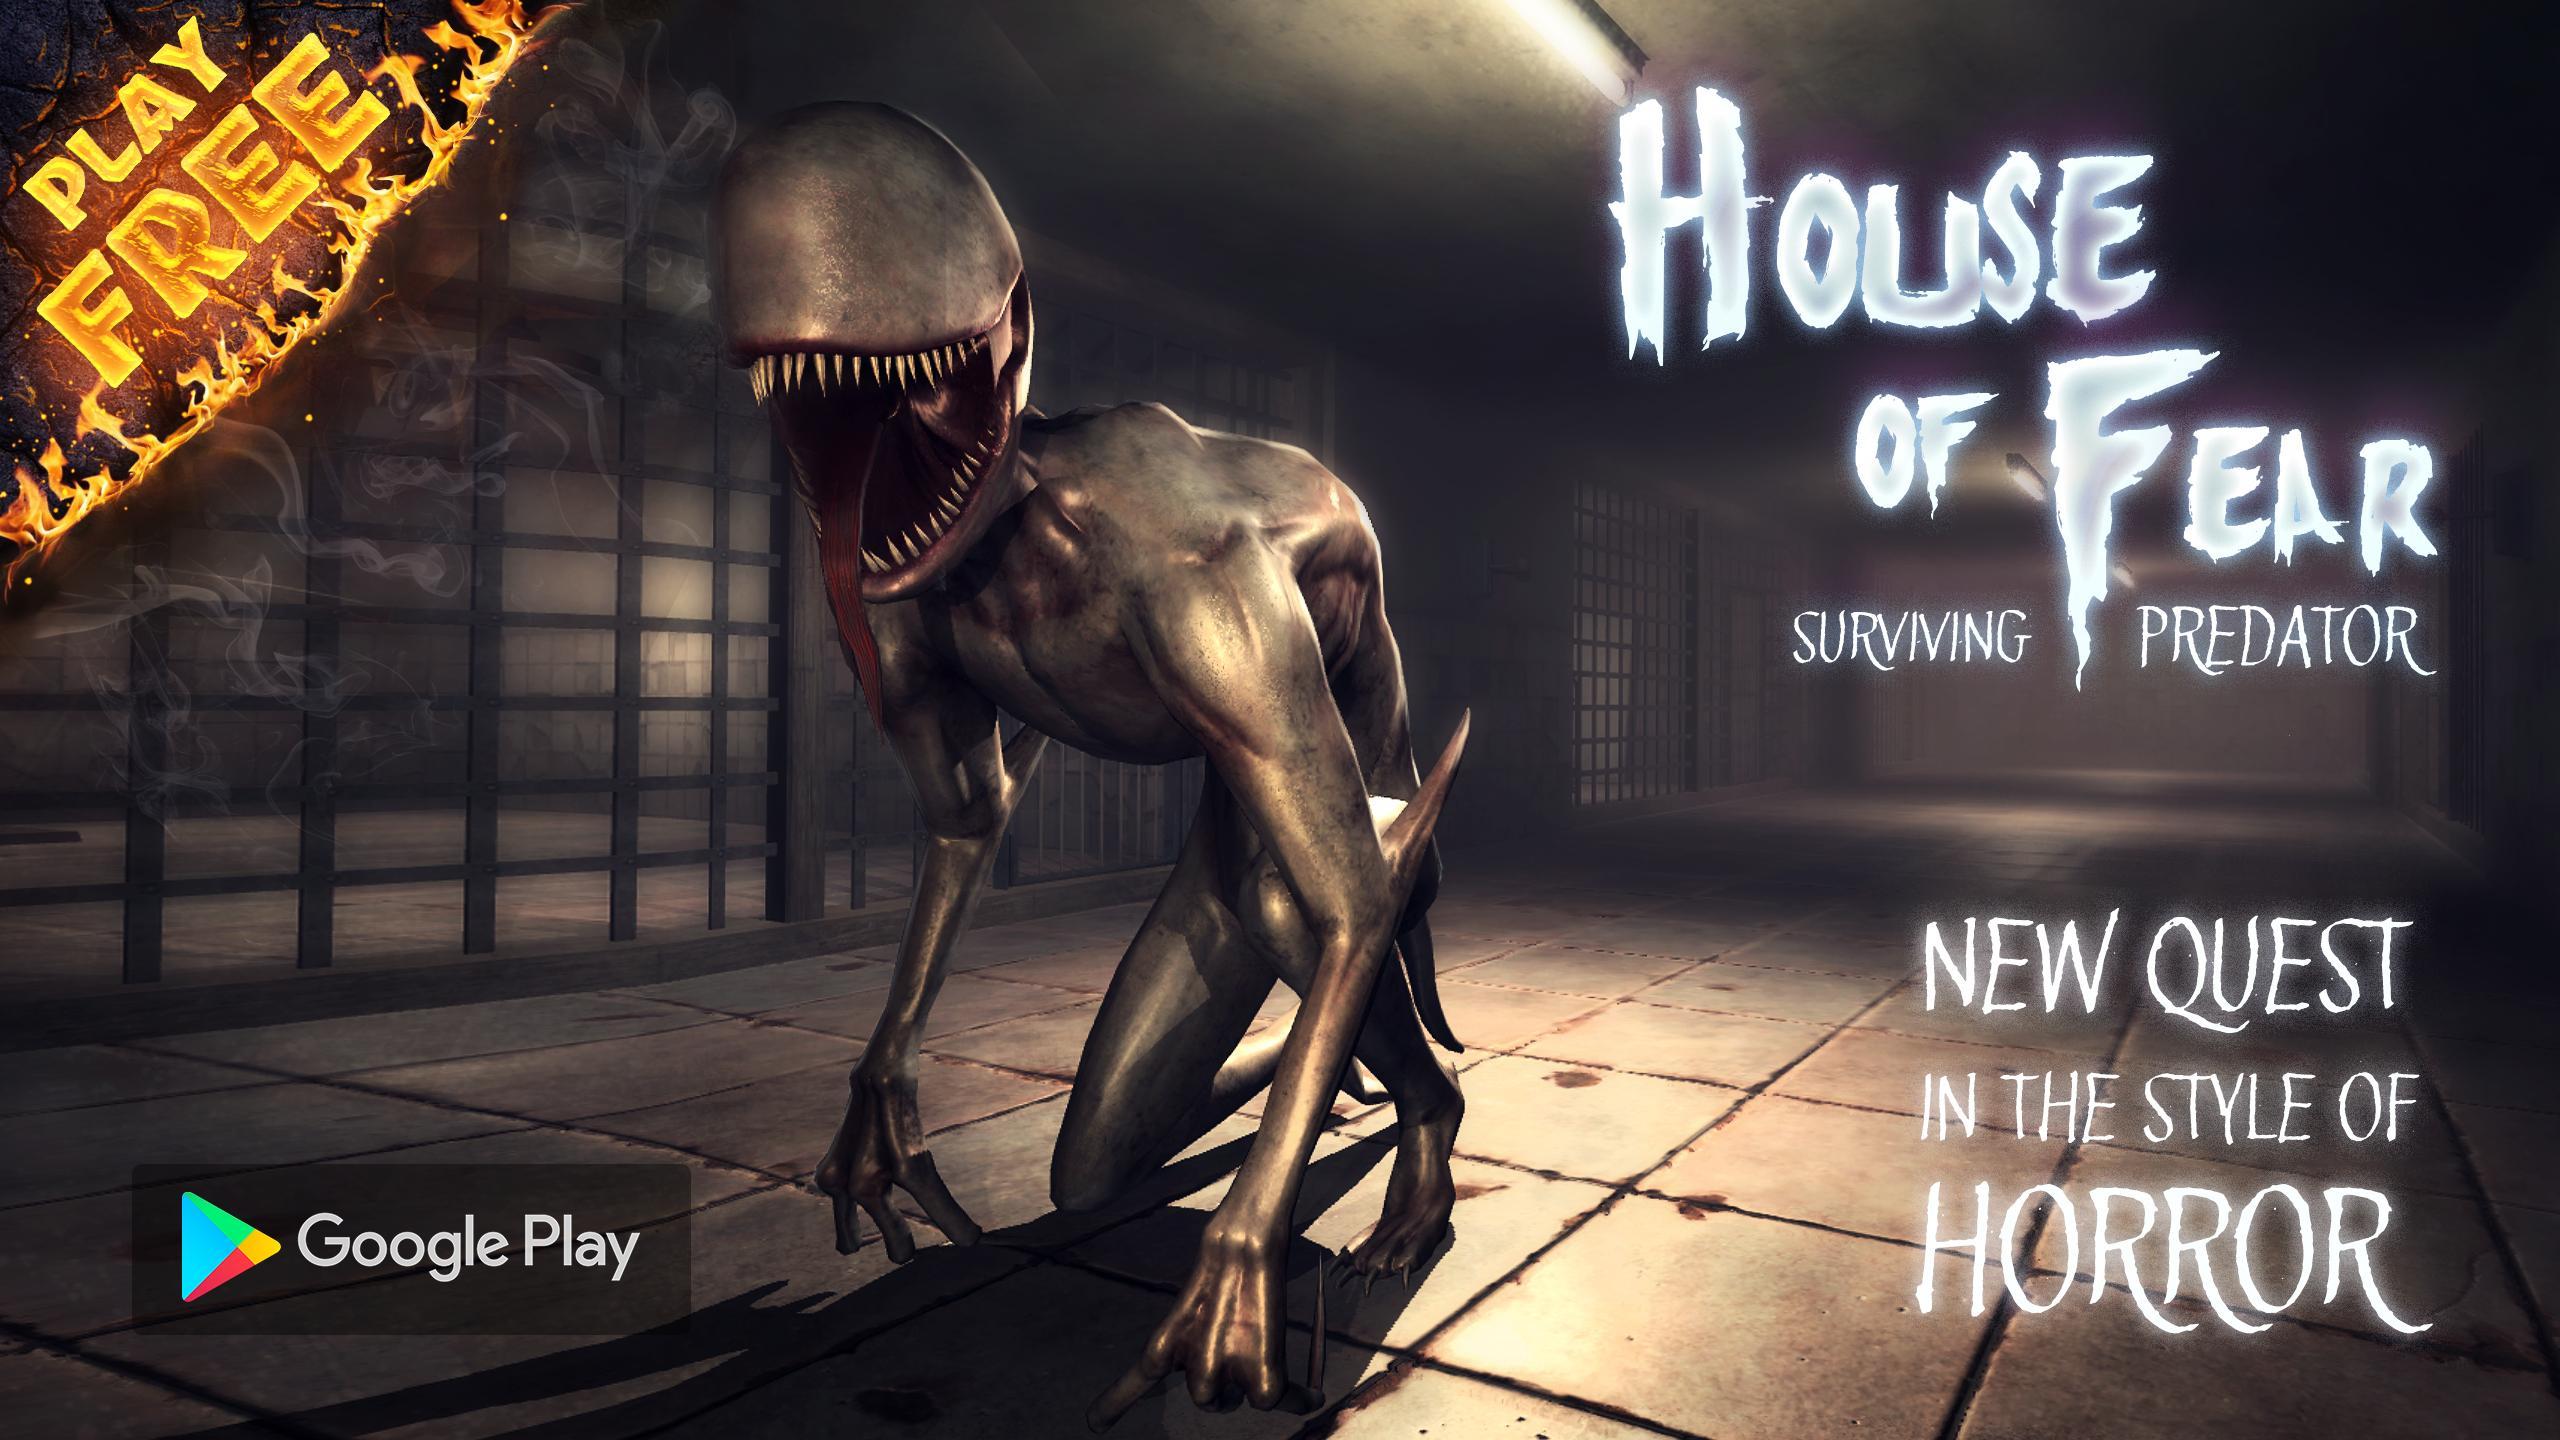 House of Fear: Surviving Predator PRO gra za darmo Android !!!(PC poprzez BlueStacks4)!!!